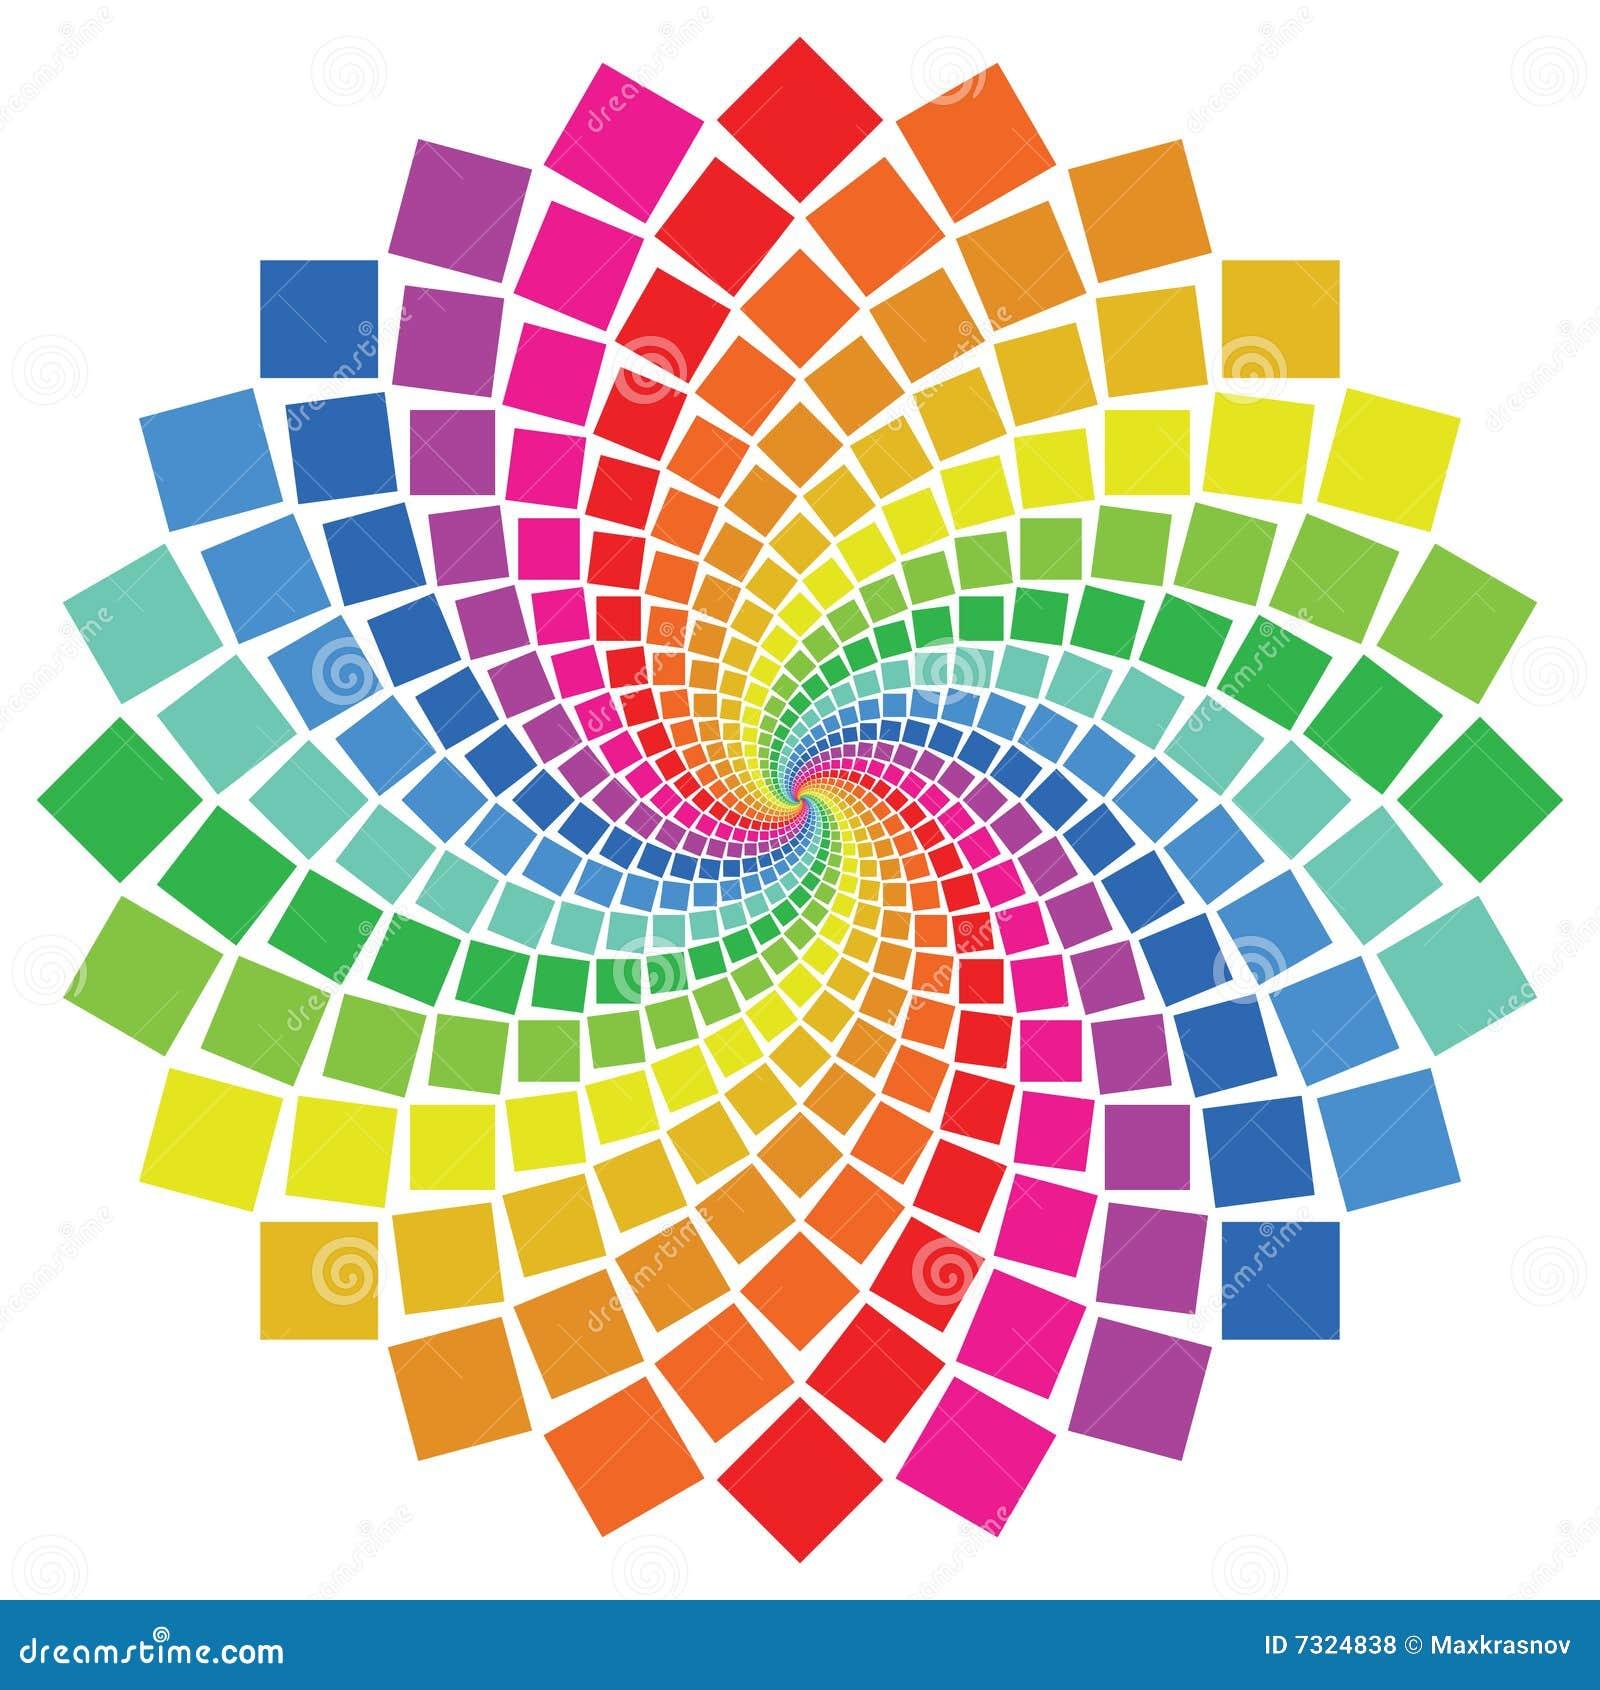 circular pattern royalty free stock photos image 7324838 sea shell clip art images seashell clip art free printable